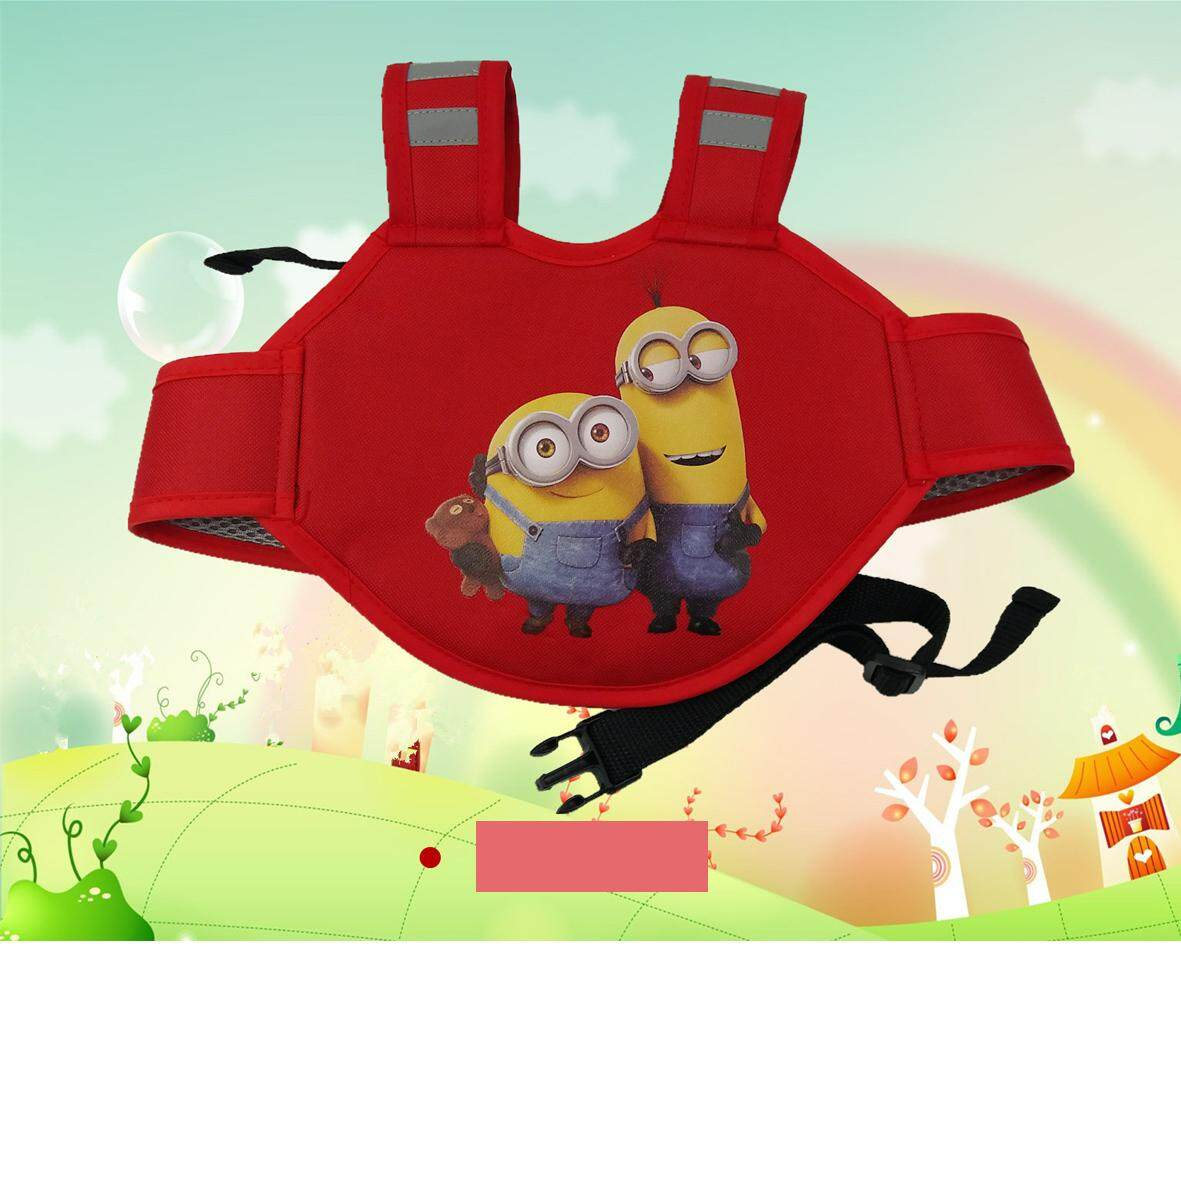 baby style สายรัดนิรภัยกันเด็กตกรถมอเตอร์ไซต์ สำหรับเด็กอายุ 3 - 10 ปี แบบกระเป๋าเป้สะพายหลัง สำหรับขับขี่มอเตอร์ไซต์ รุ่น:D1